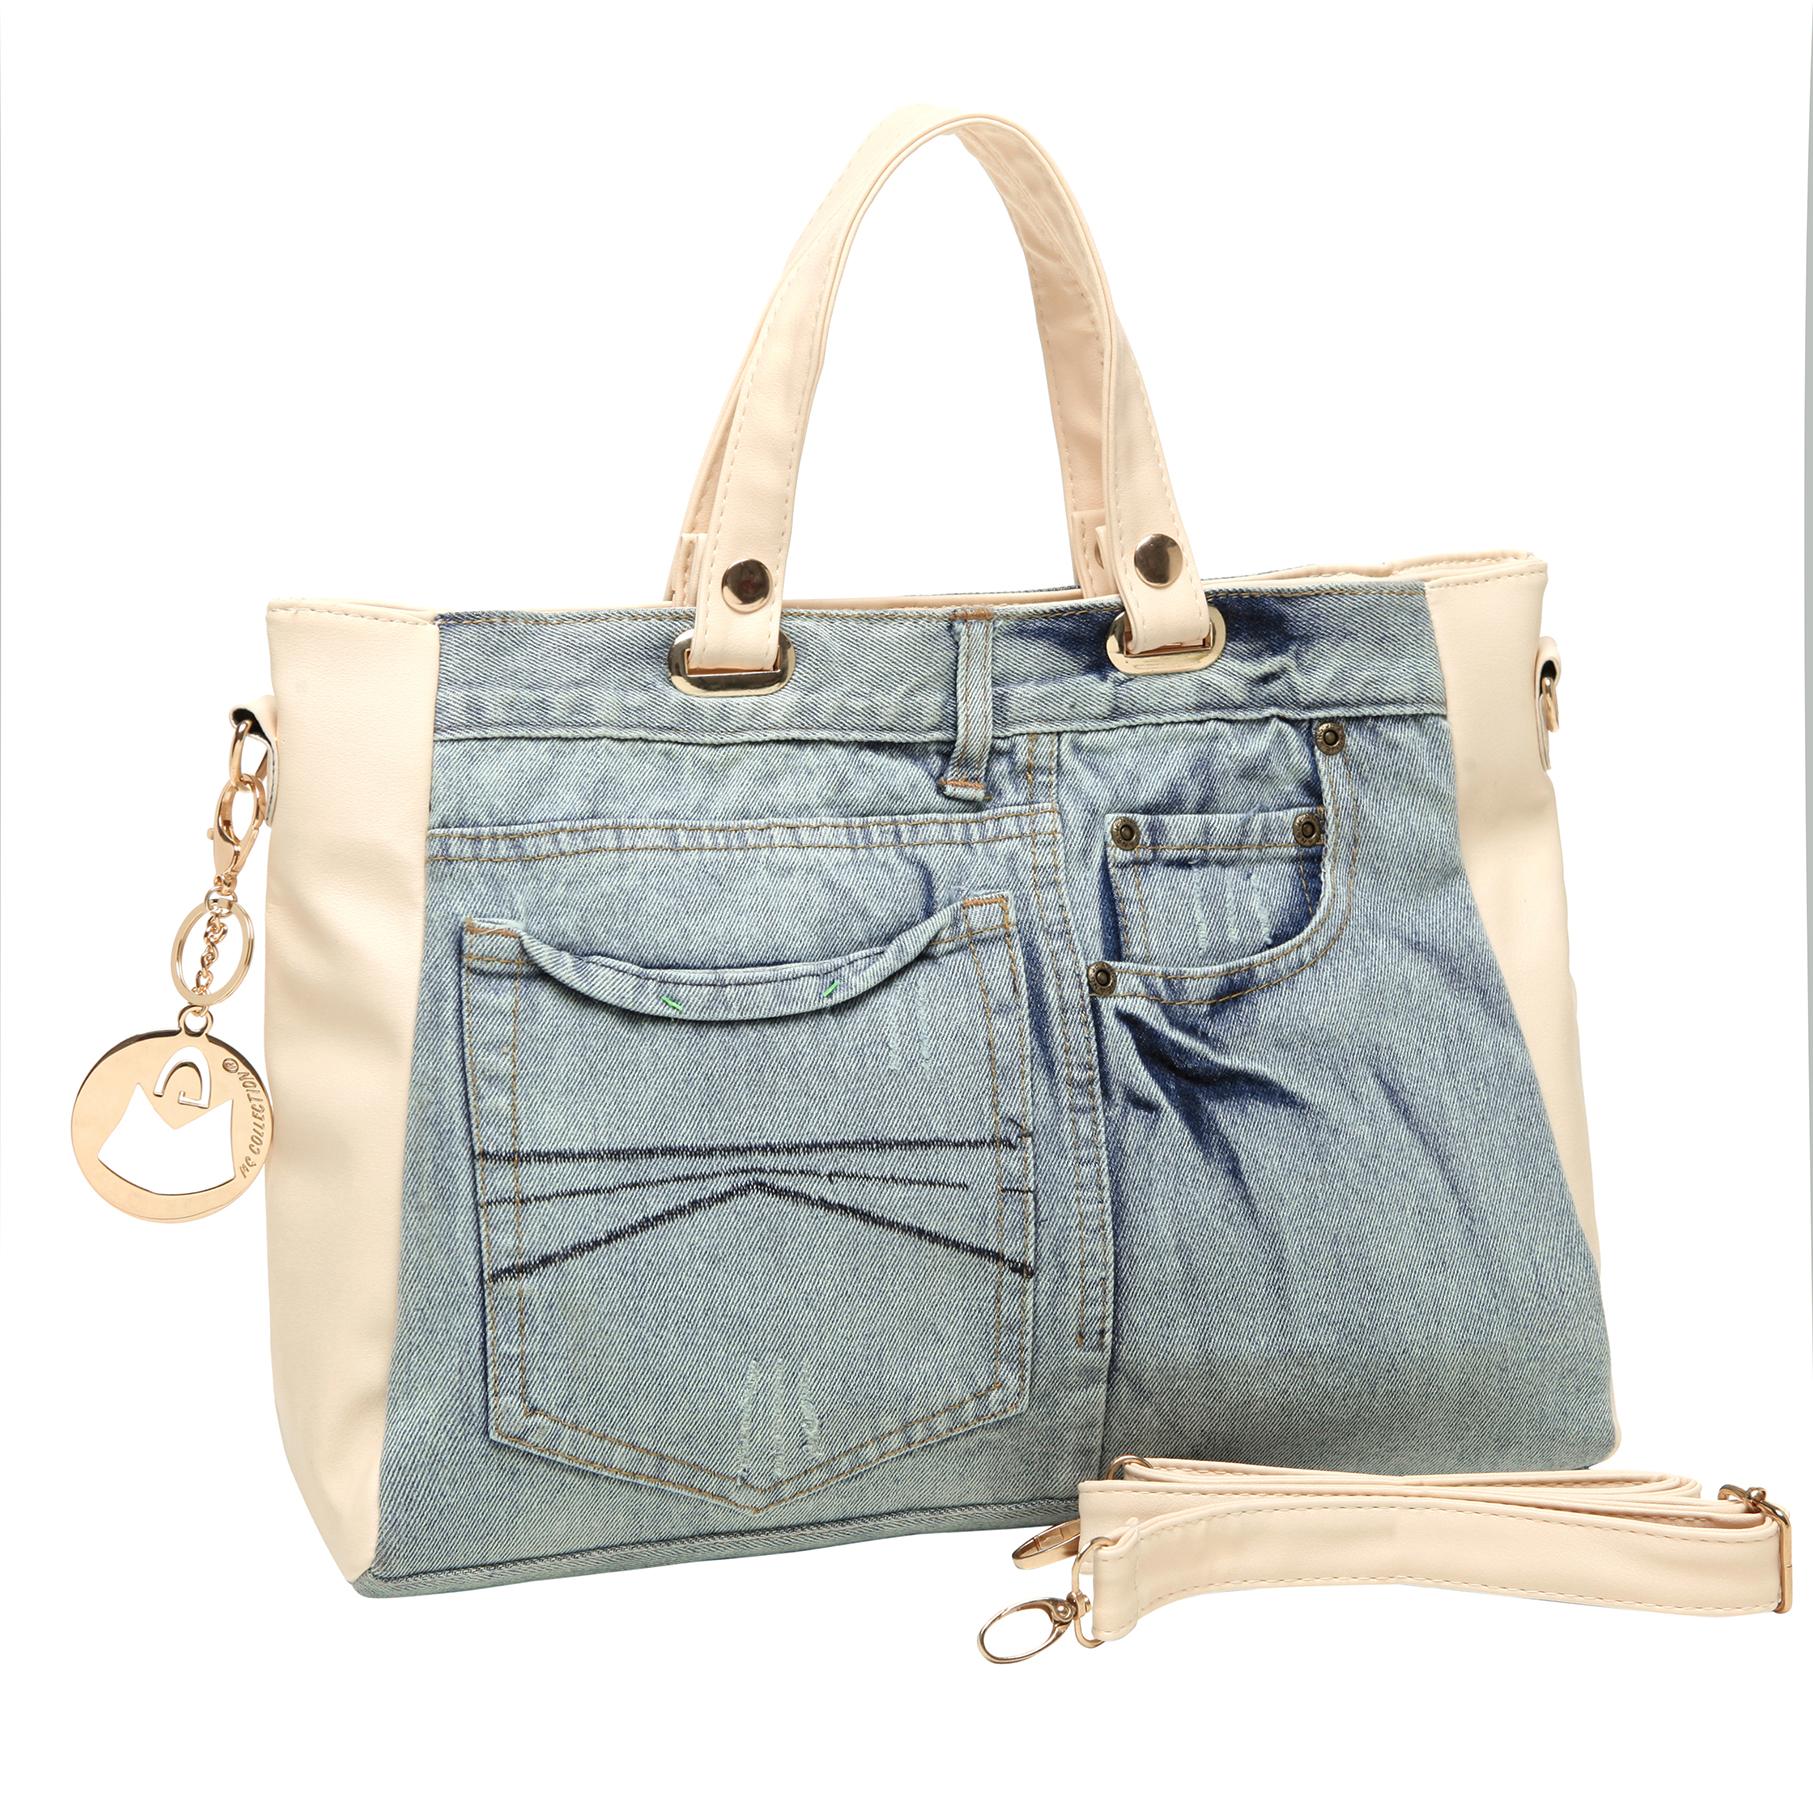 ASTA Beige & Blue Denim Jeans Handbag main